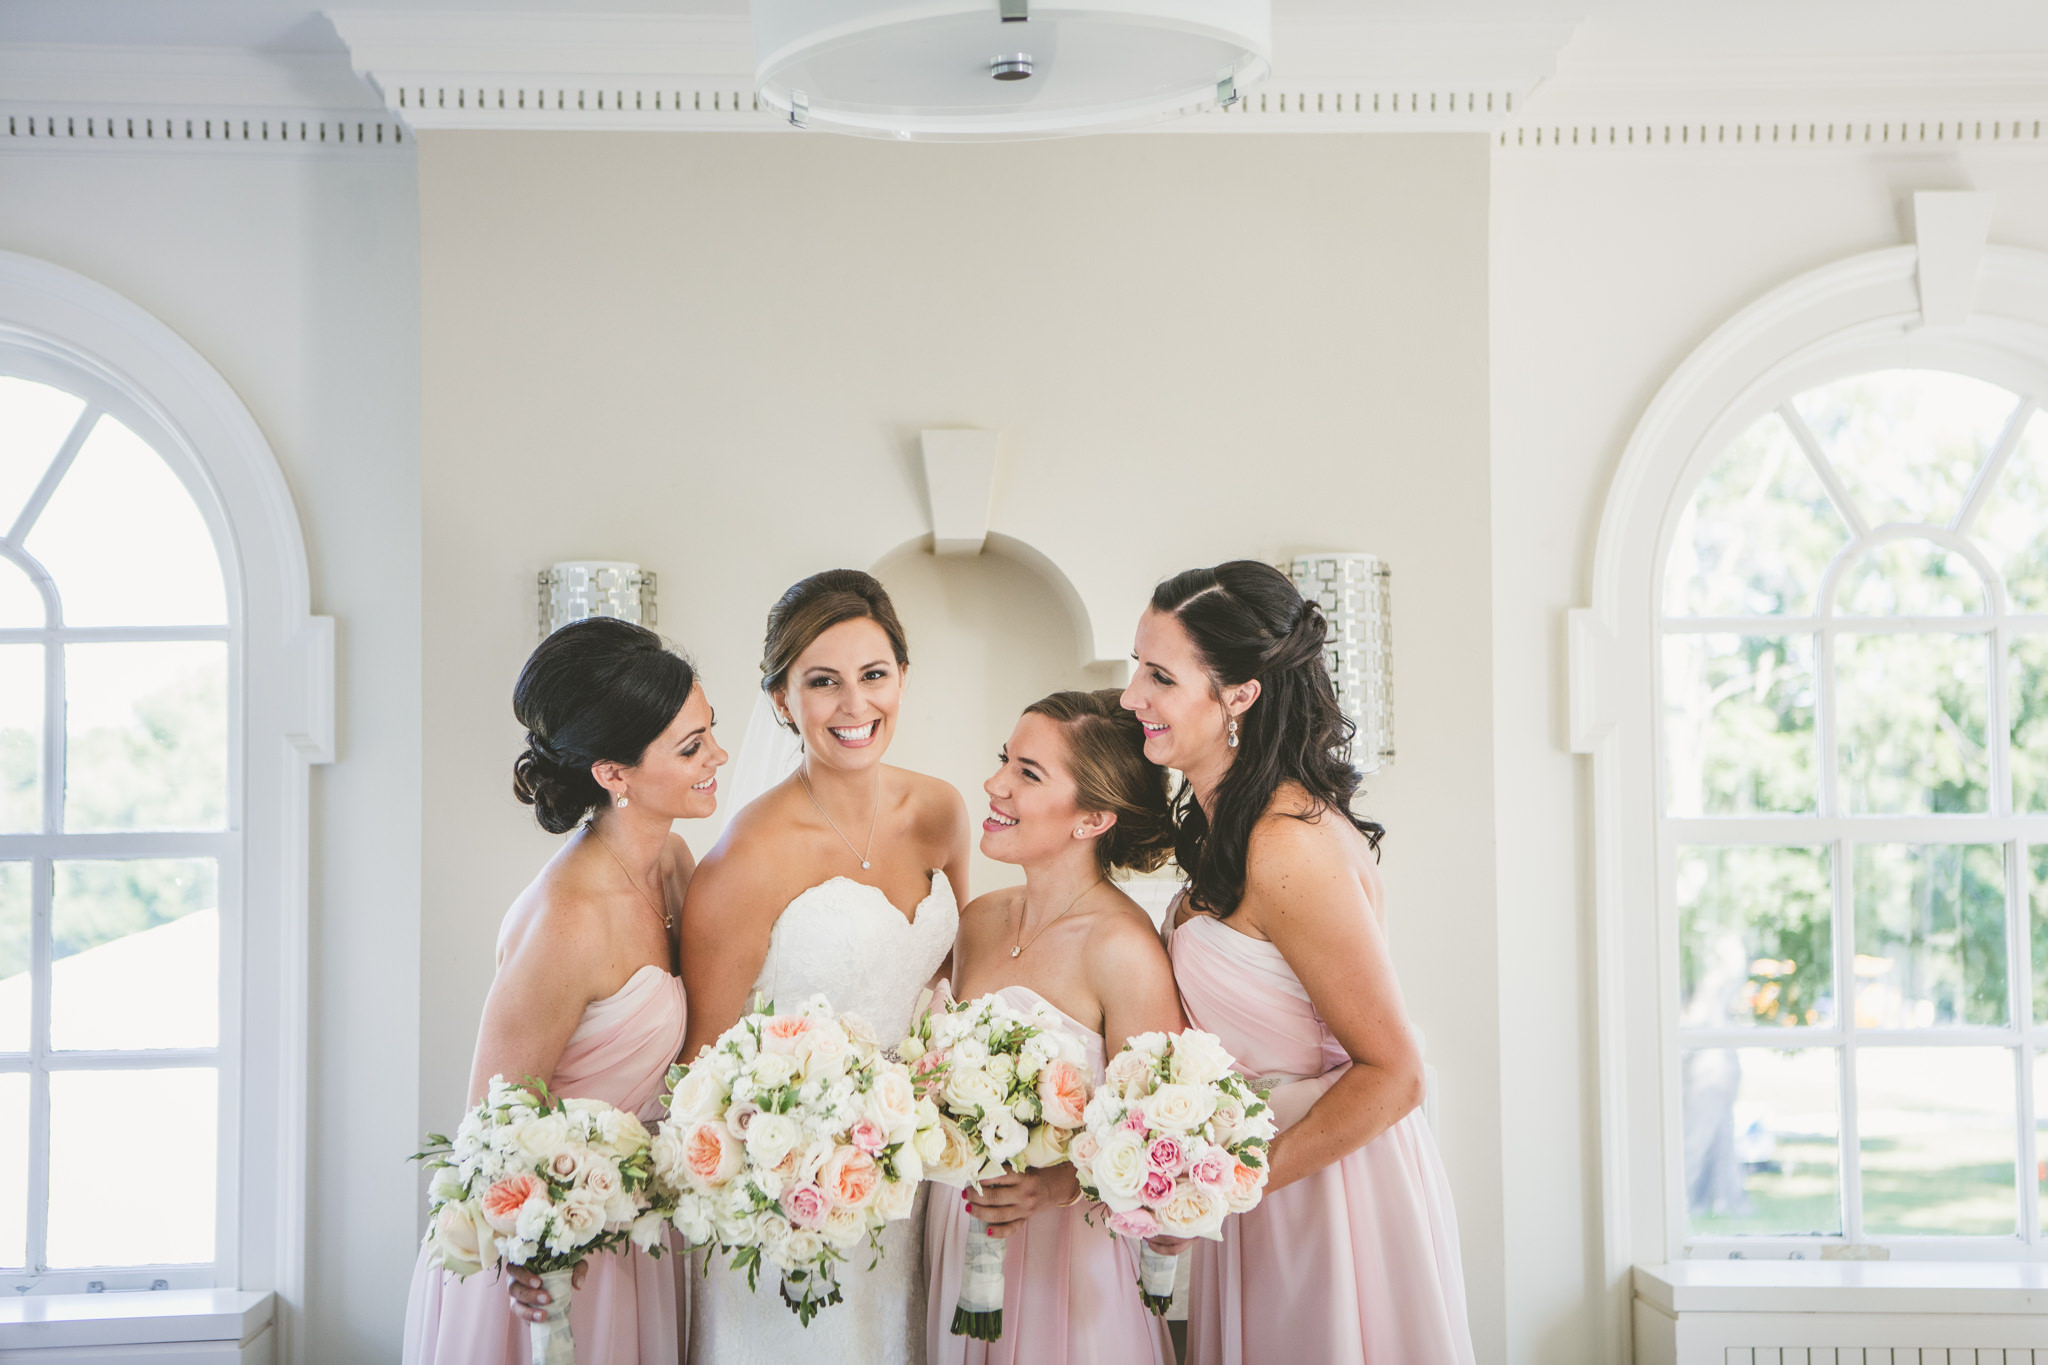 mclean house wedding photos 183 - McLean House Wedding Part 1